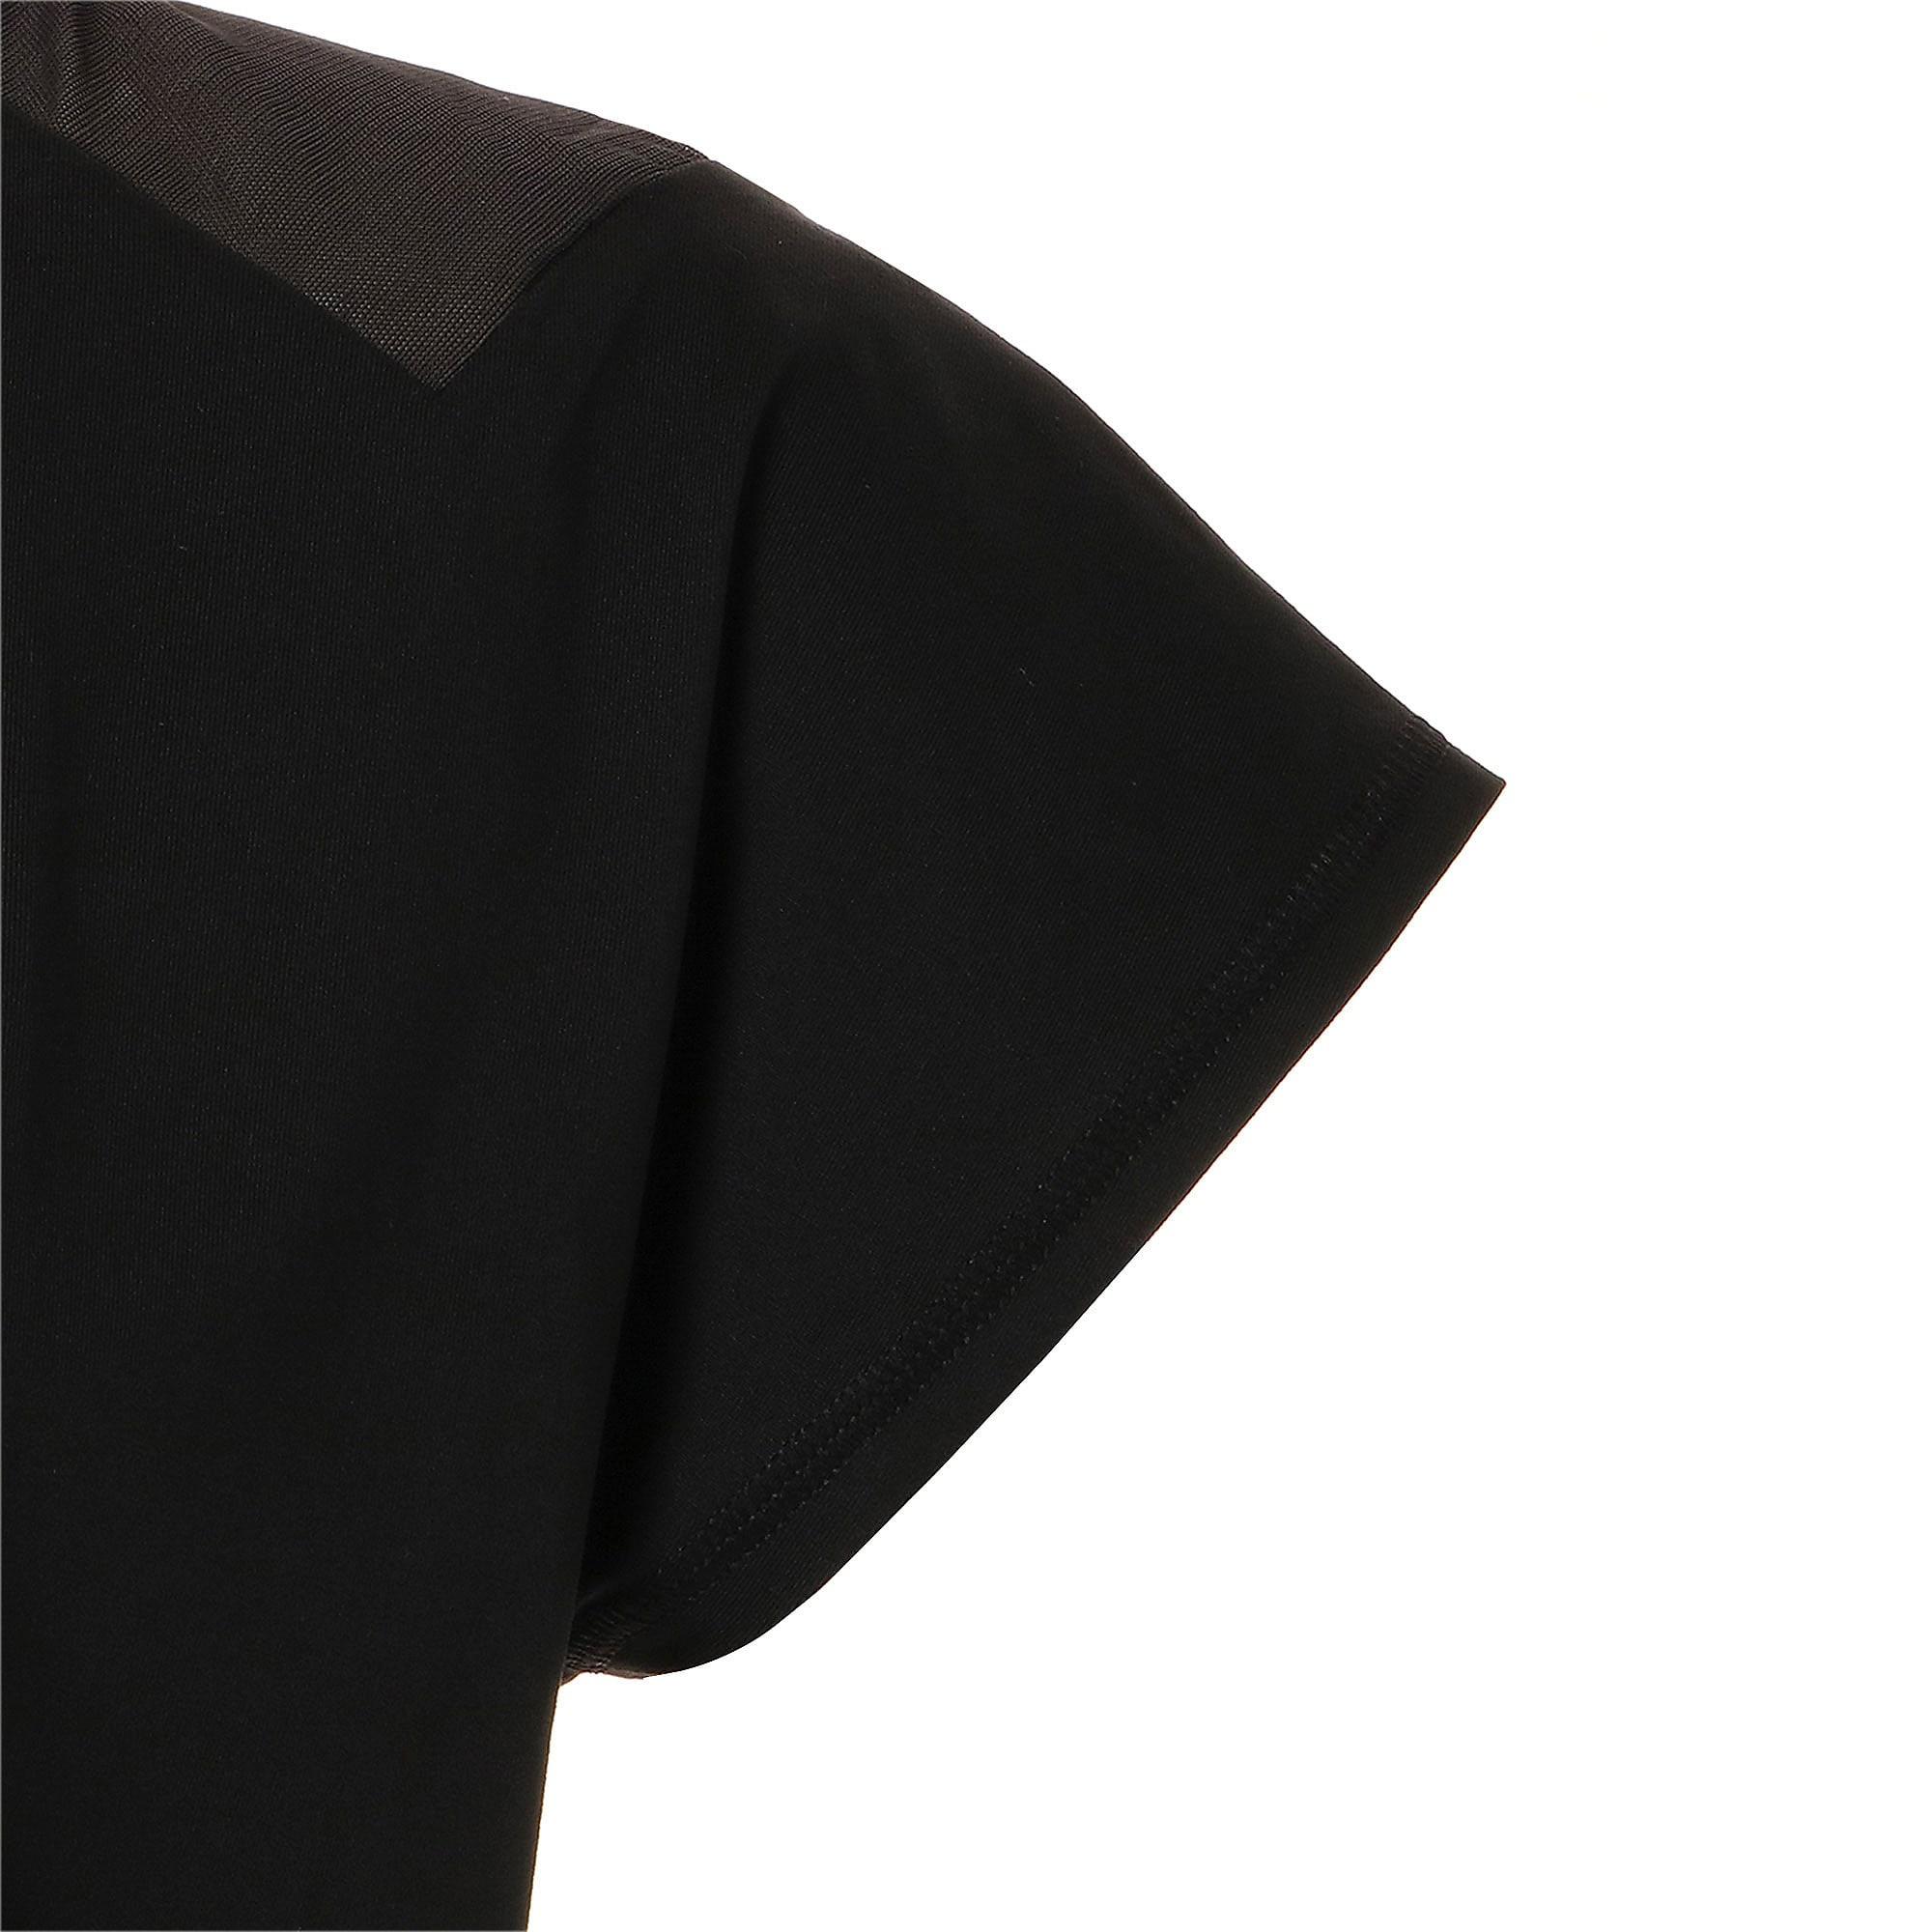 Thumbnail 8 of スタジオ SS メッシュ ウィメンズ トレーニング Tシャツ 半袖, Puma Black, medium-JPN